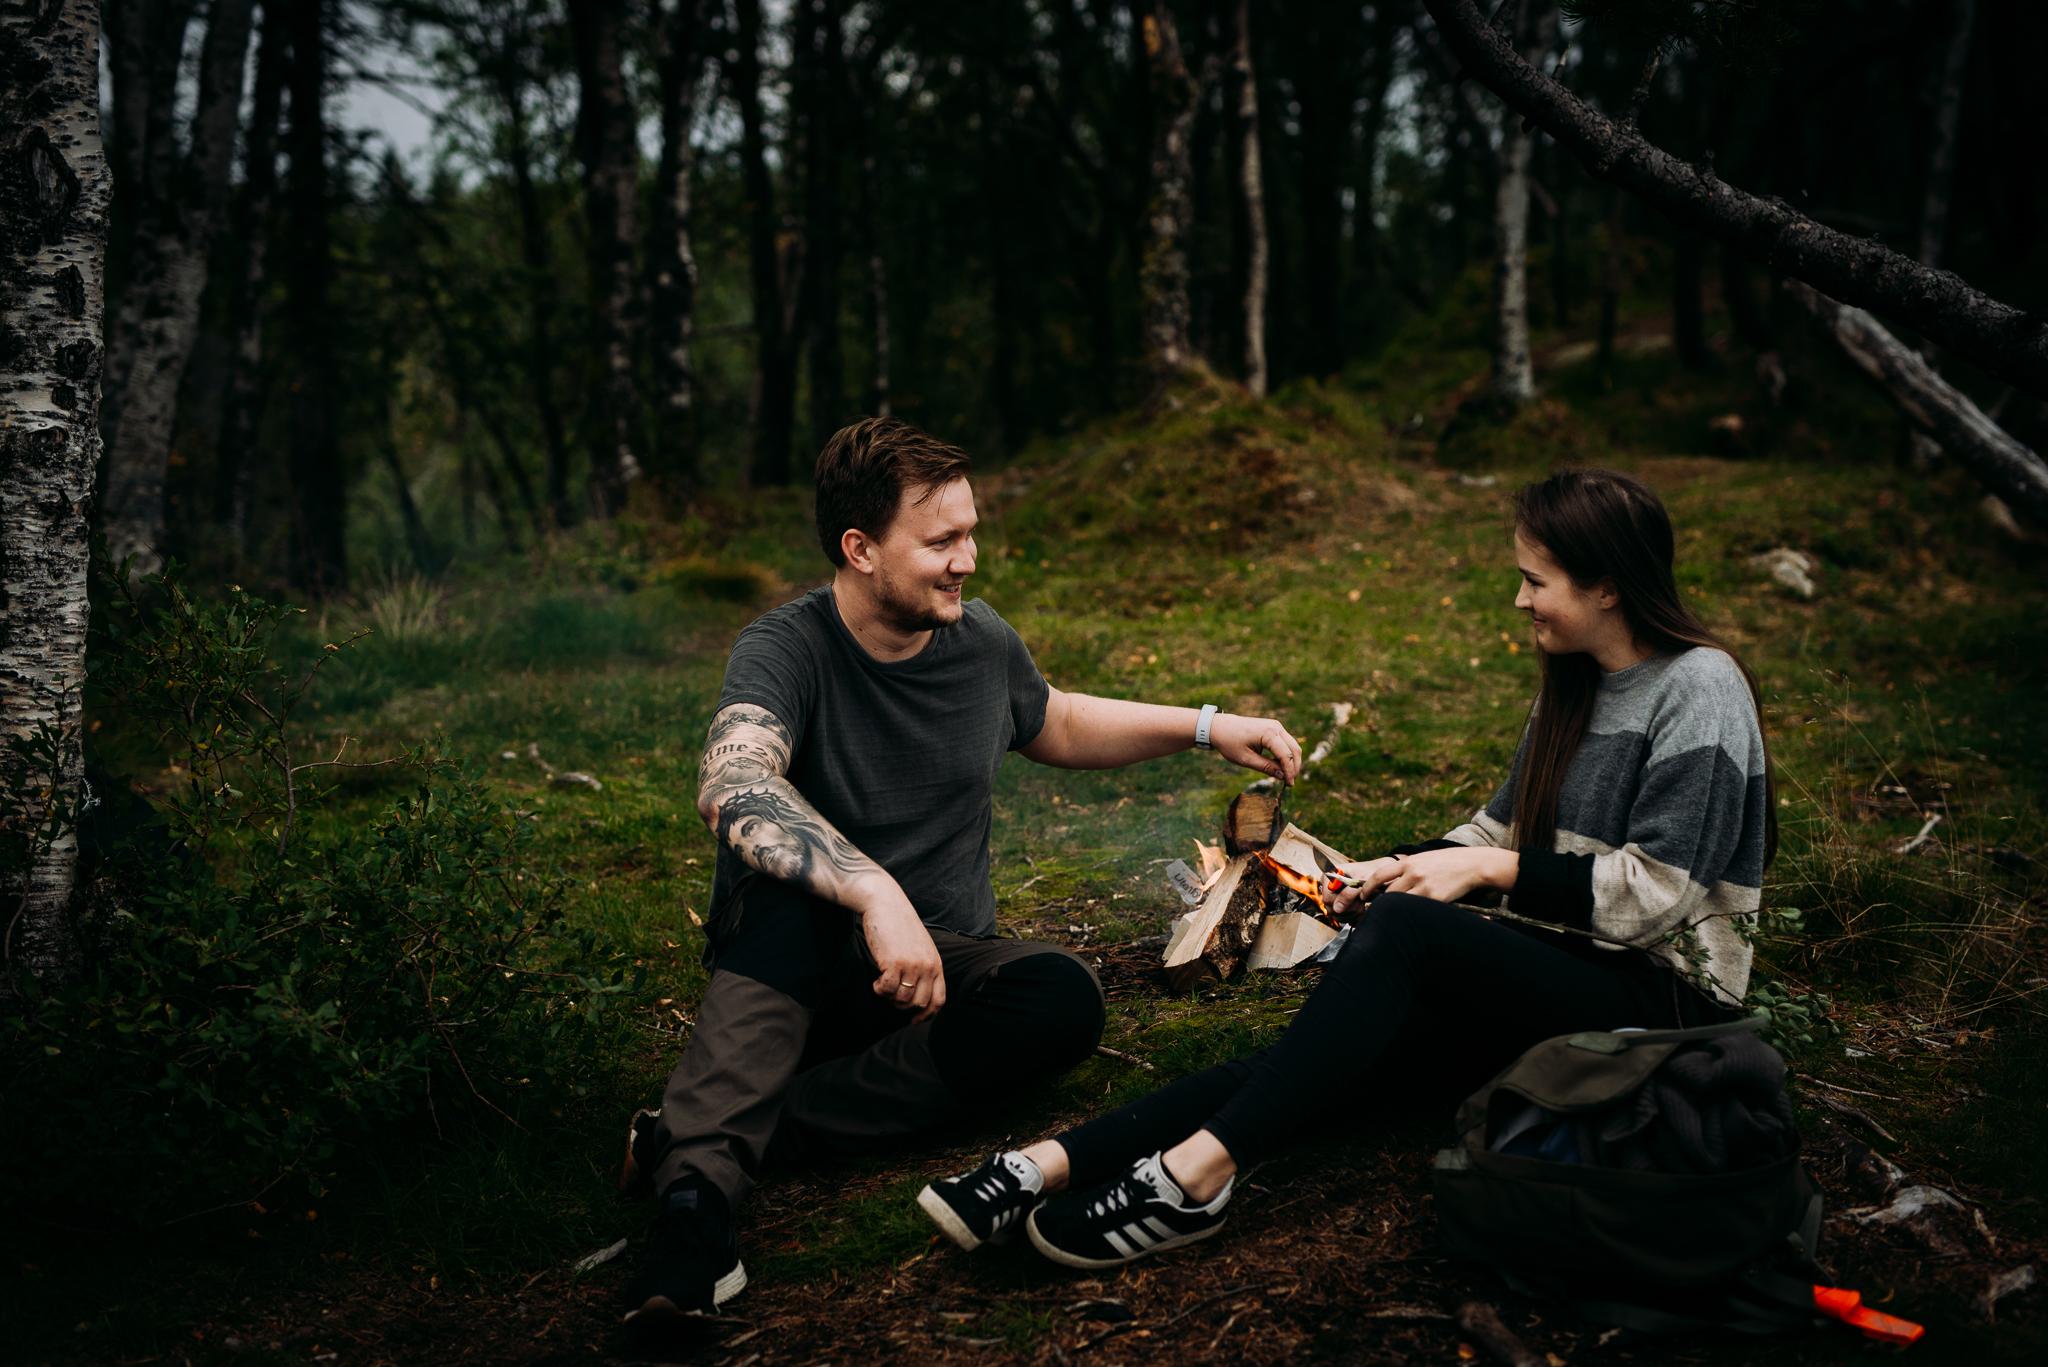 Wedding and elopement photographer in Norway. Bergen wedding photographer. Norwegian fjords photographer.